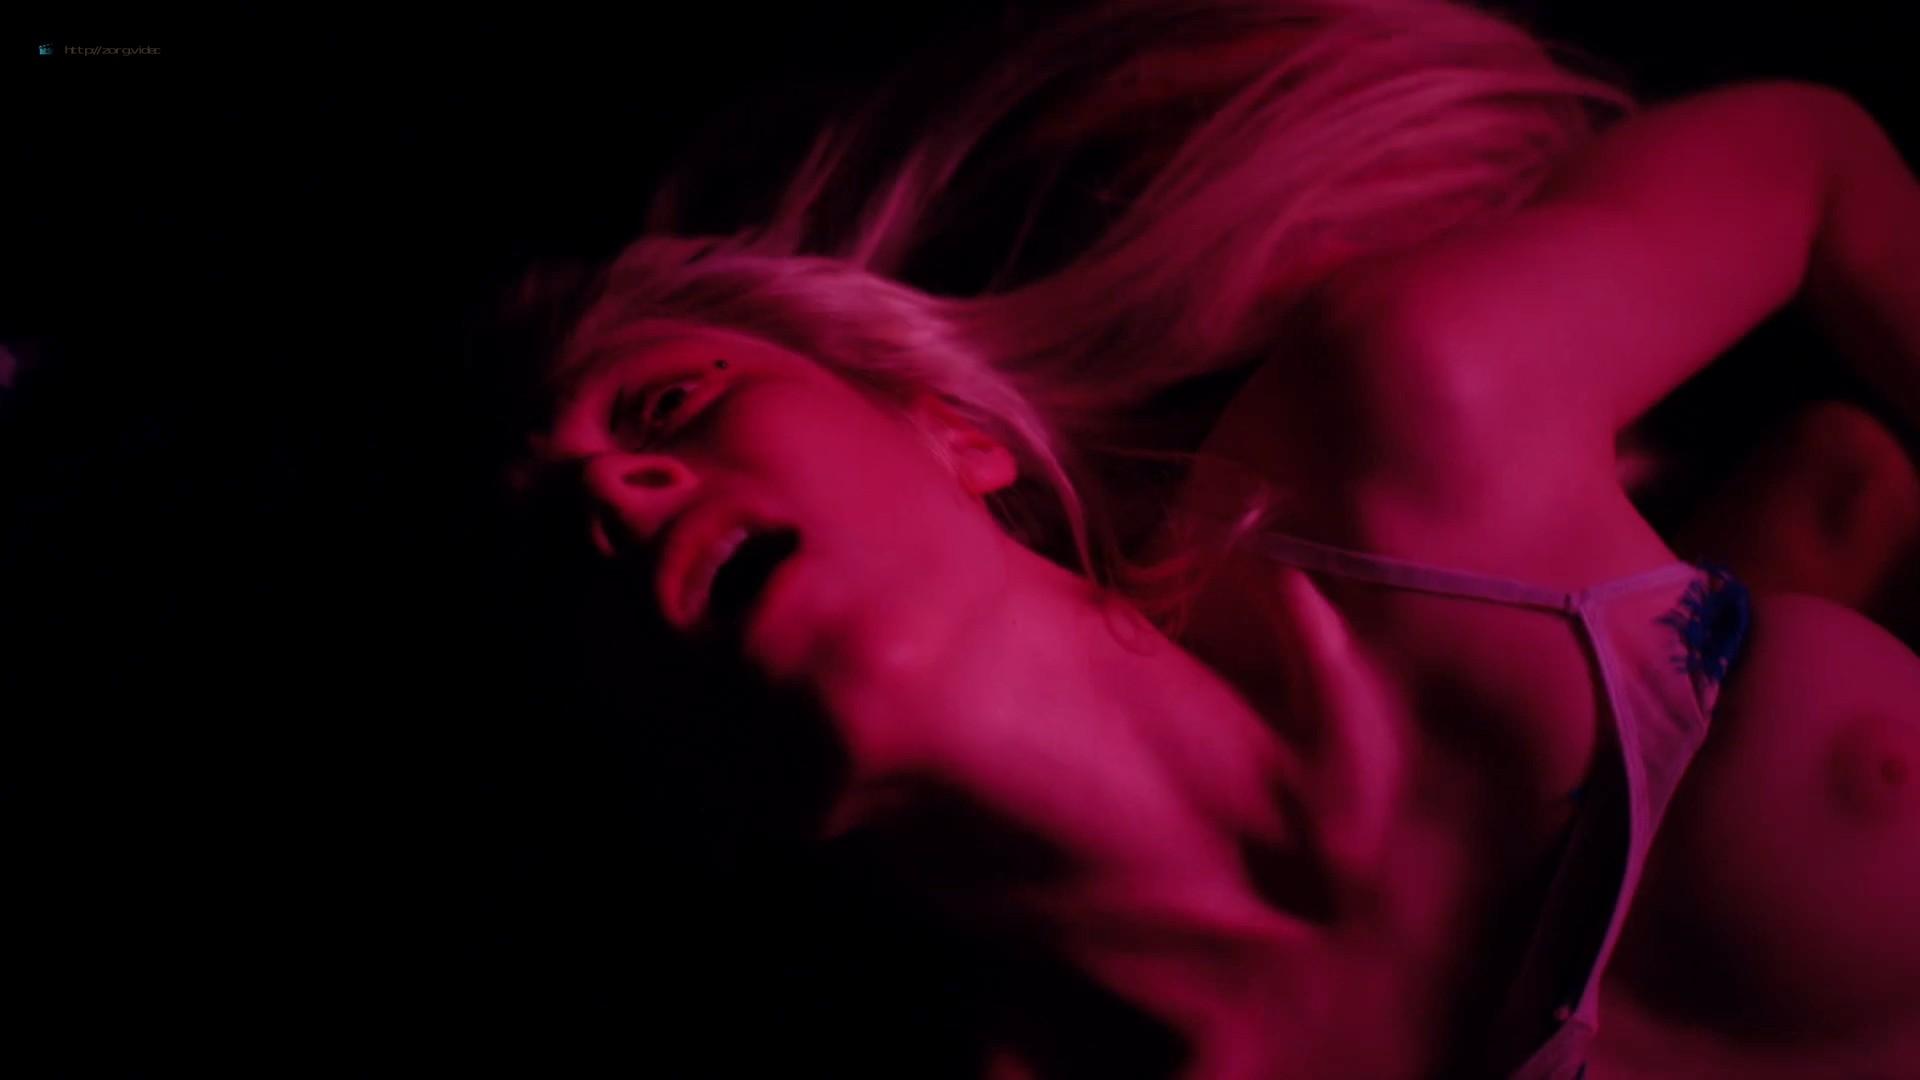 Hunter Schafer nude topless, Sydney Sweeney, Zendaya hot - Euphoria (2019) s1e7 HD 1080p (4)